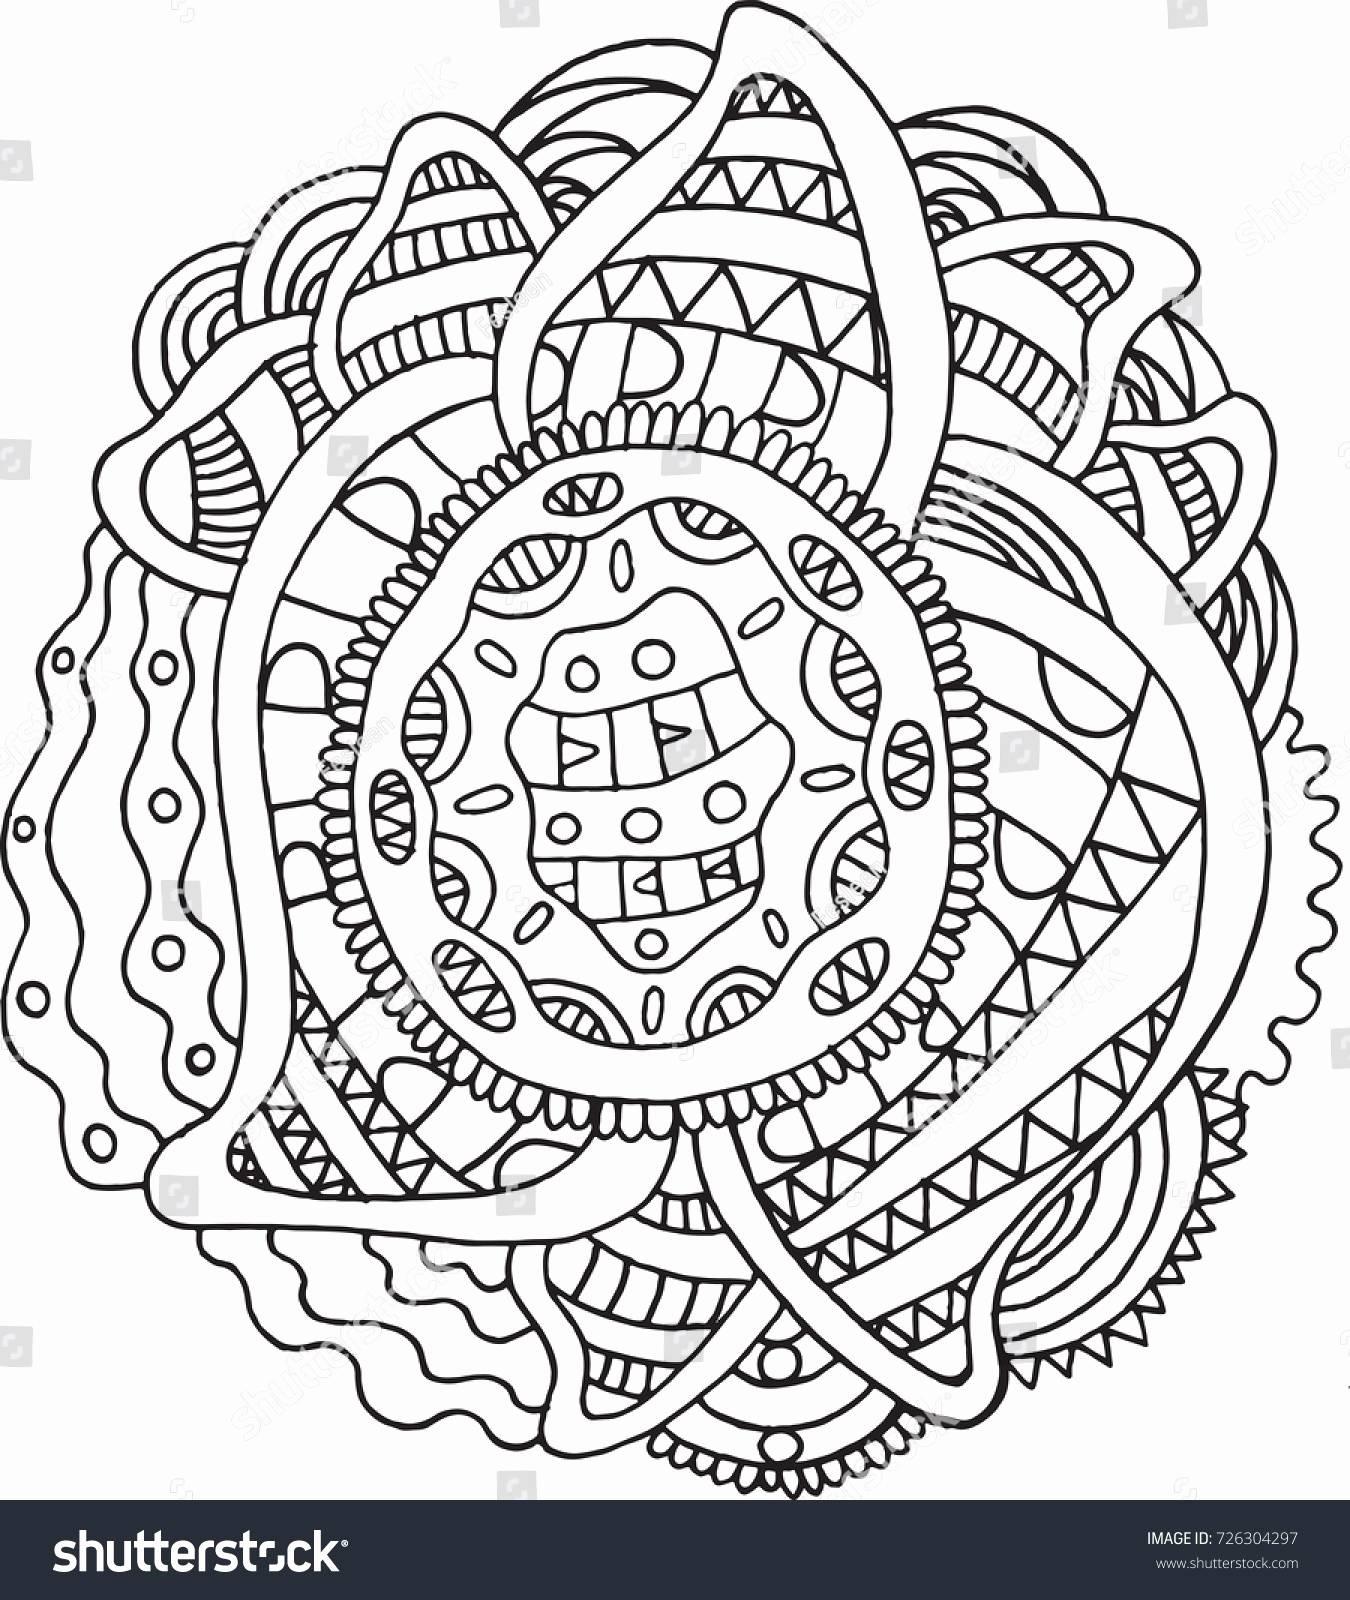 1350x1600 Aztec Mask Template Inspirational Tribal Print Drawing